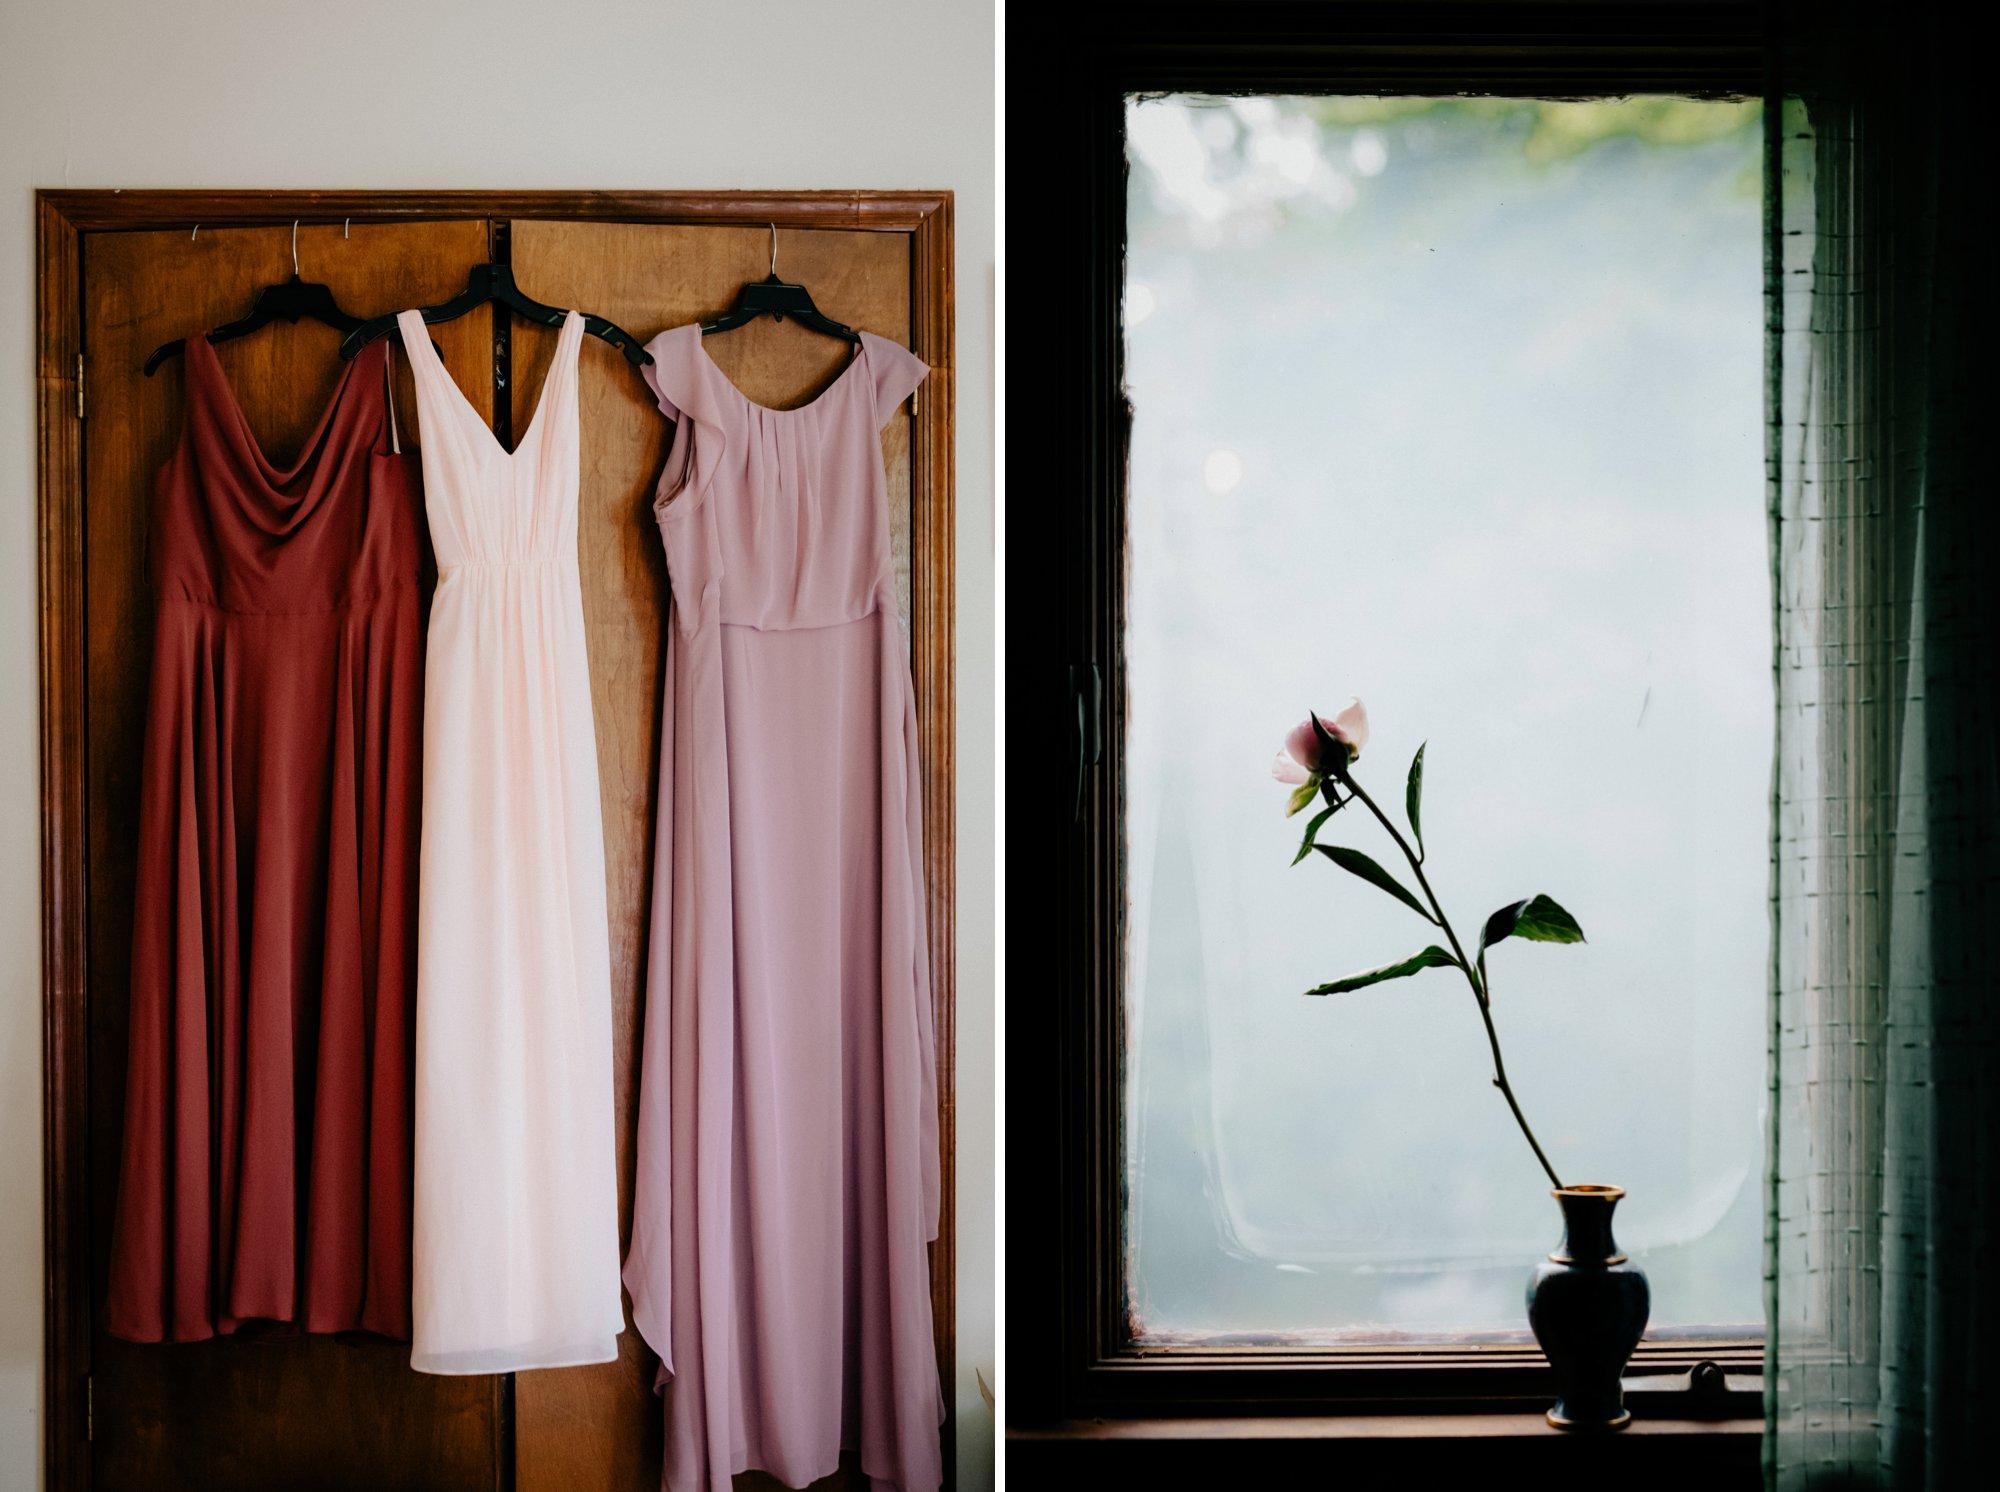 Philadelphia New Jersey Jockey Hollow Wedding Abandoned Athletic Courts Porche Jimmy Choos Bridesmaids dresses blush palette